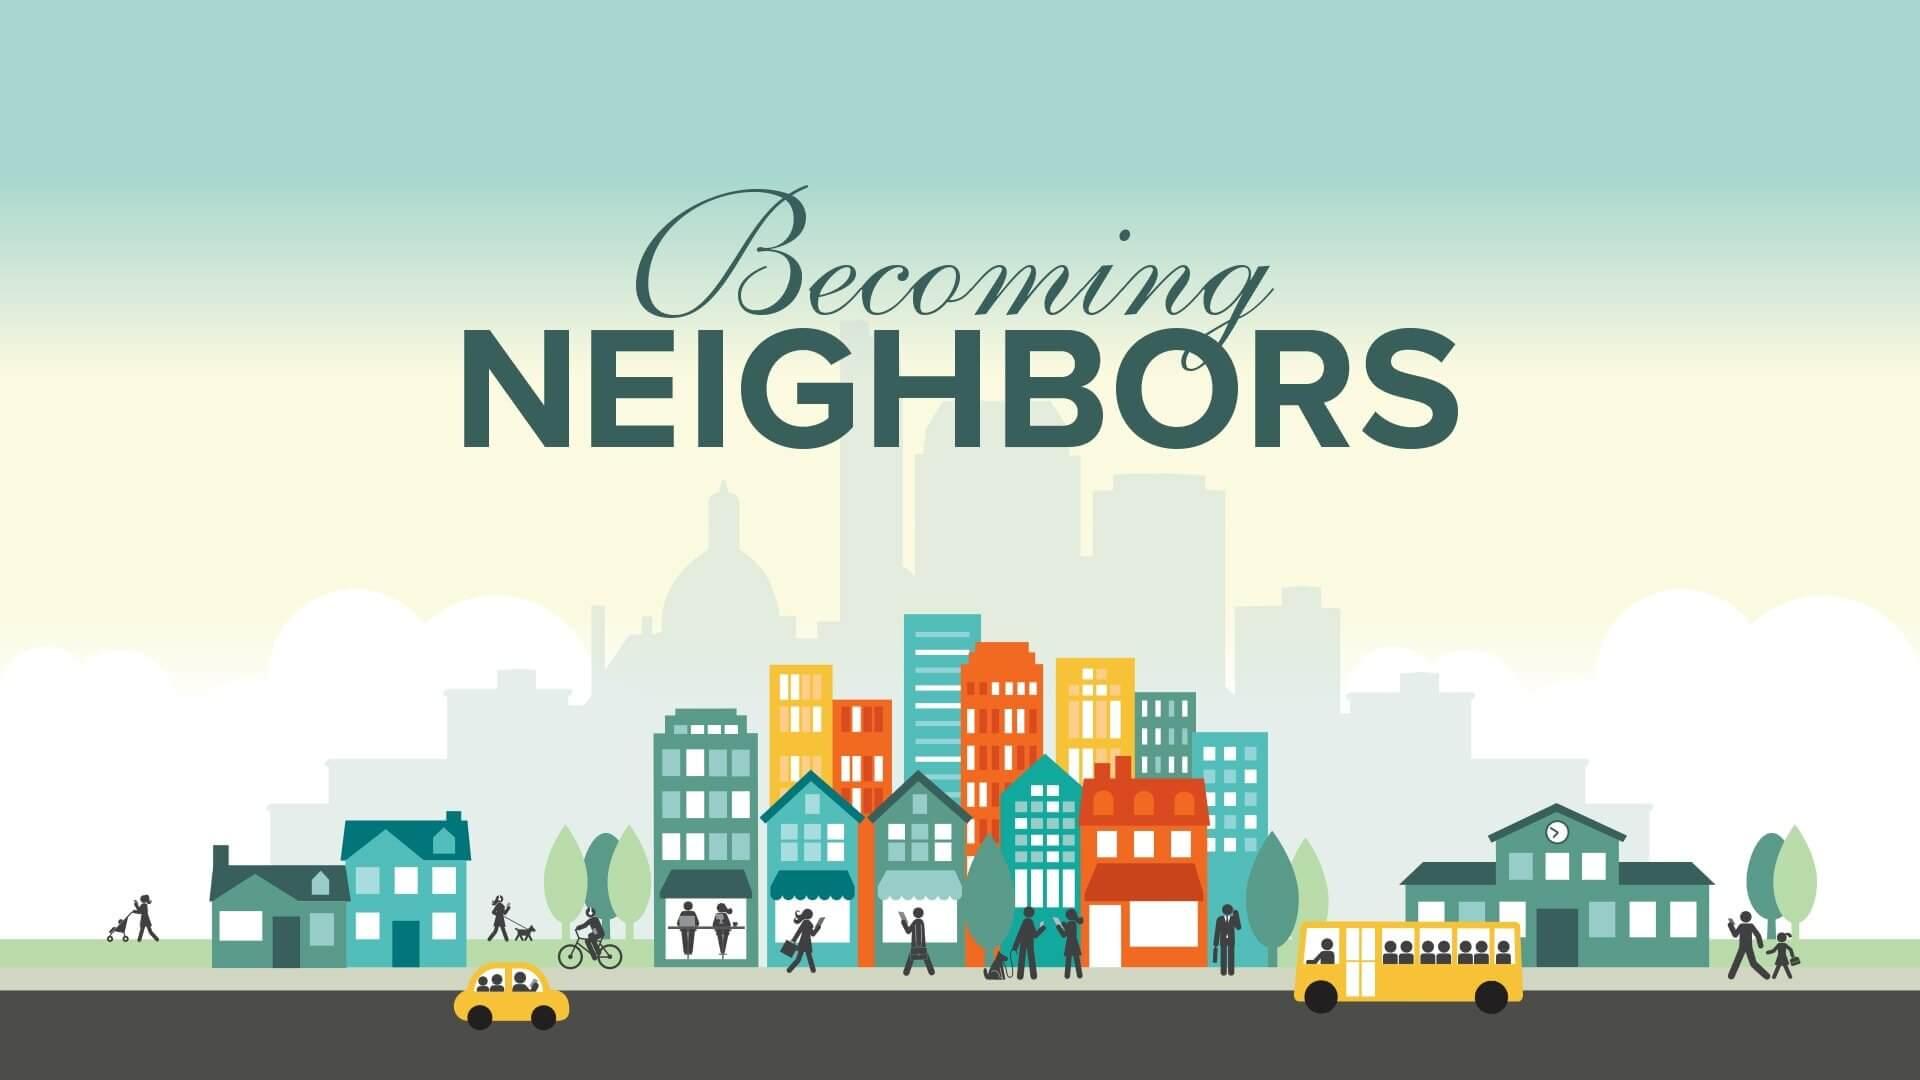 Becoming Neighbors